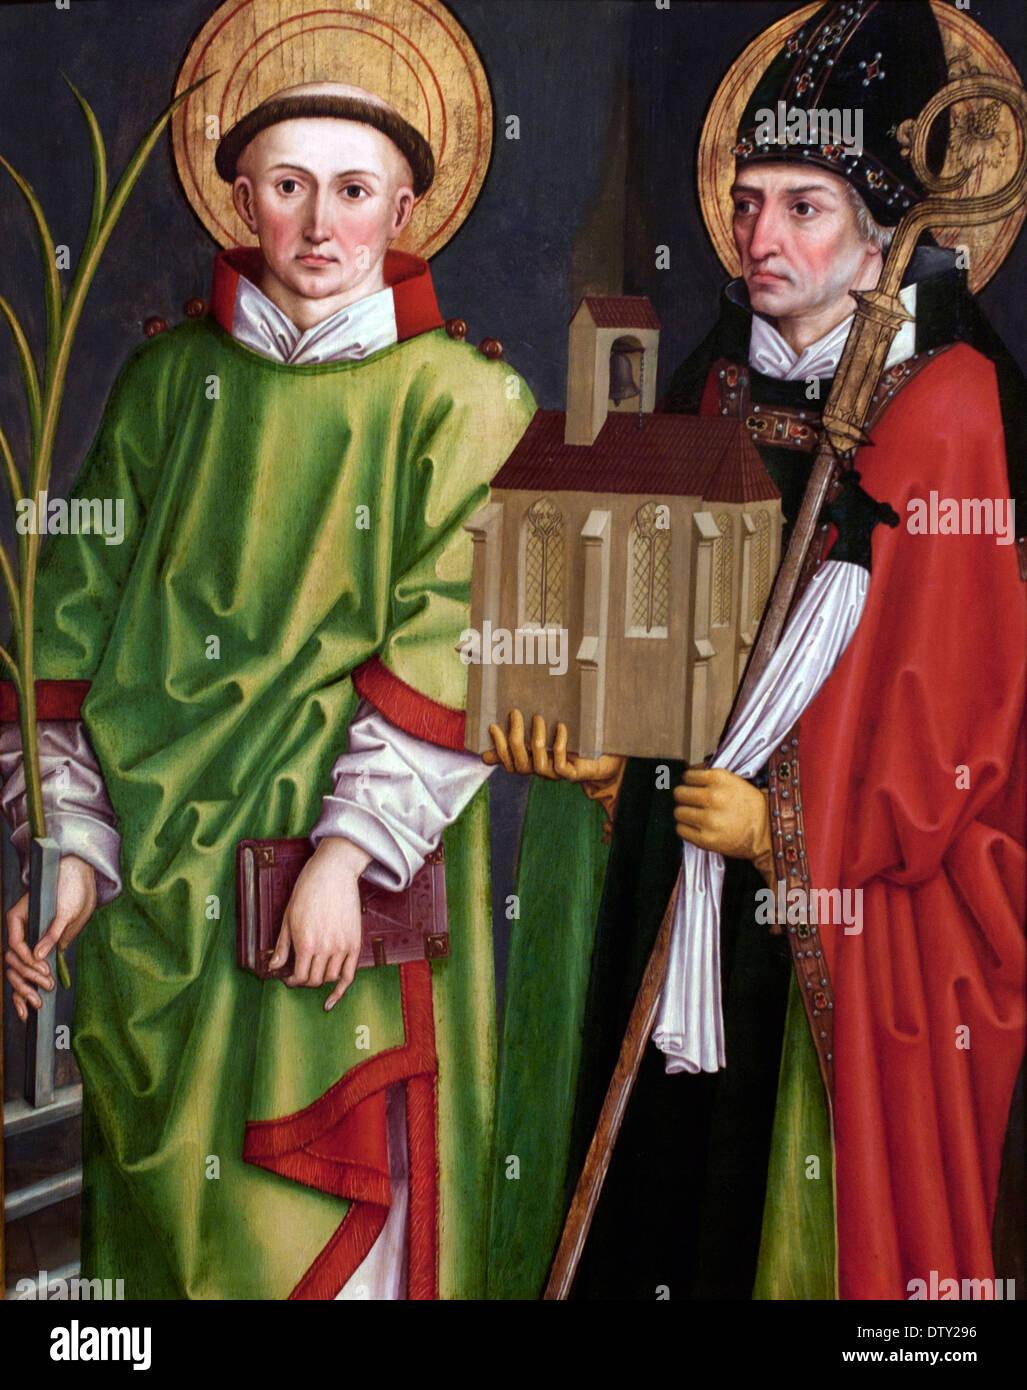 St. Lawrence and Wolfgang - Die Heiligen Laurentius und Wolfgang 1490 Bartholomäus - Bartholomew Zeitblom 1460 - 1522 German - Stock Image